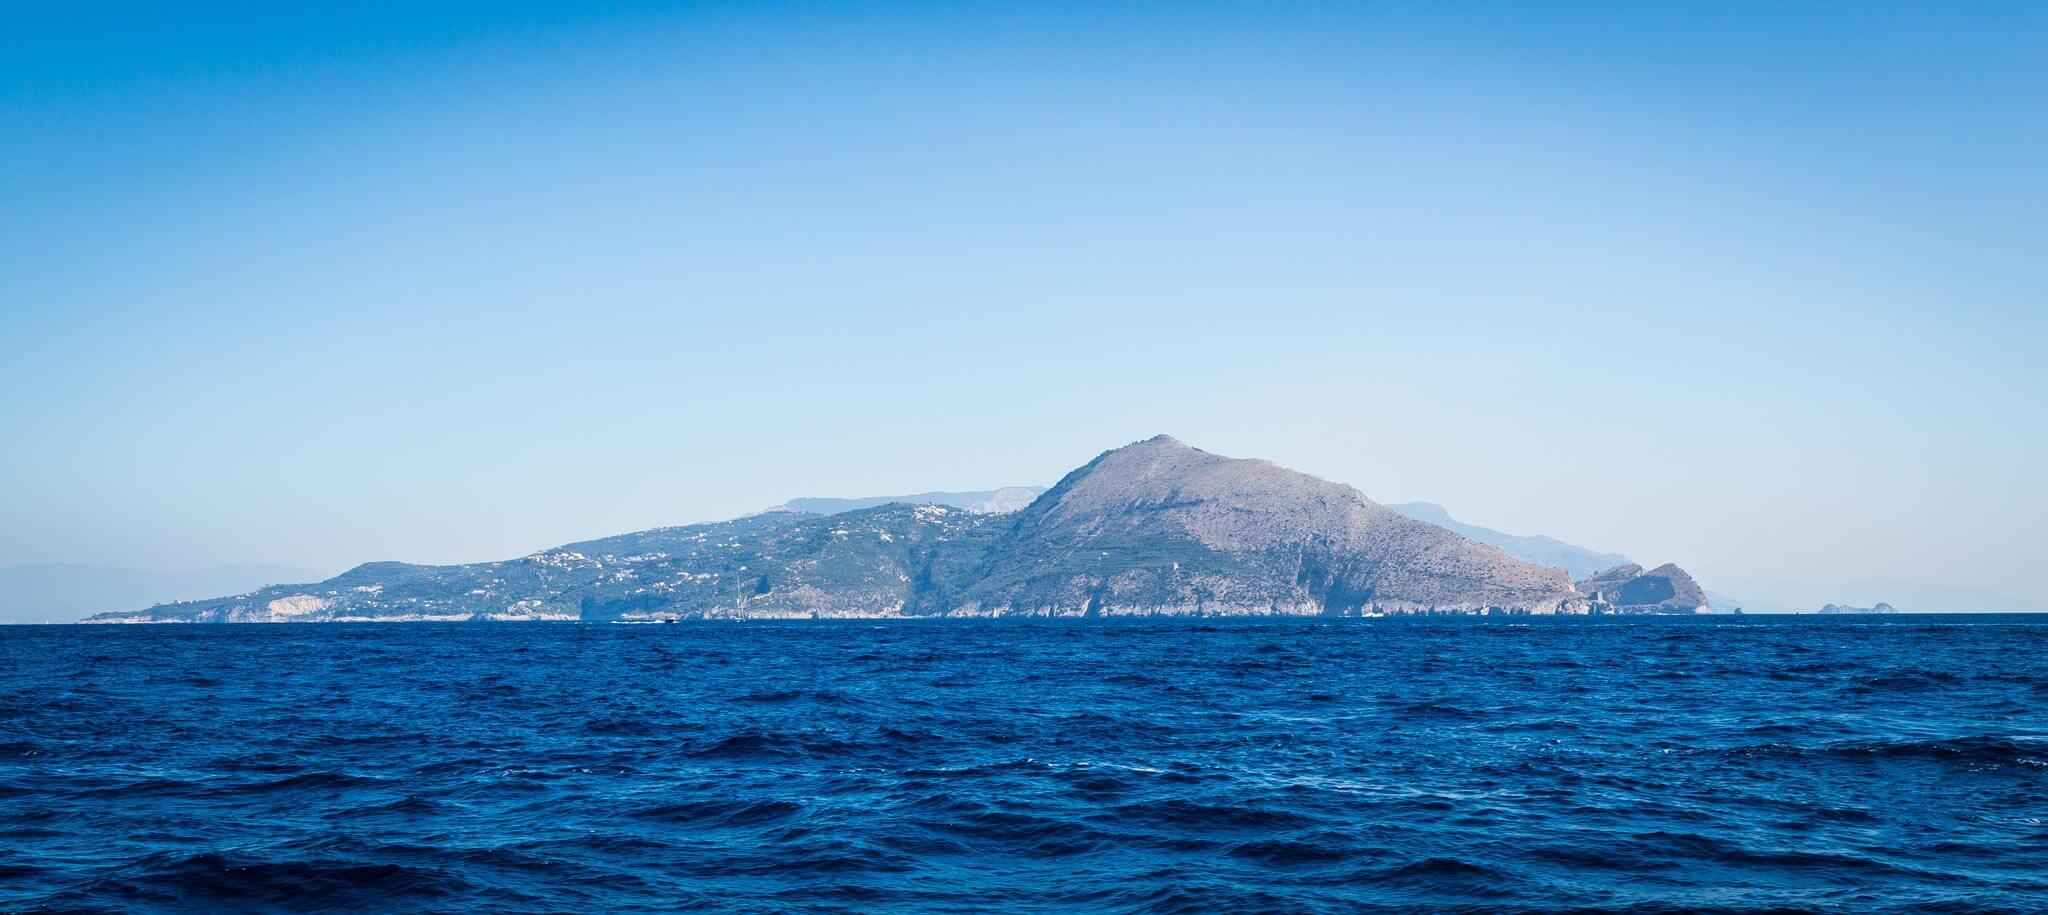 Sorrento boat tours